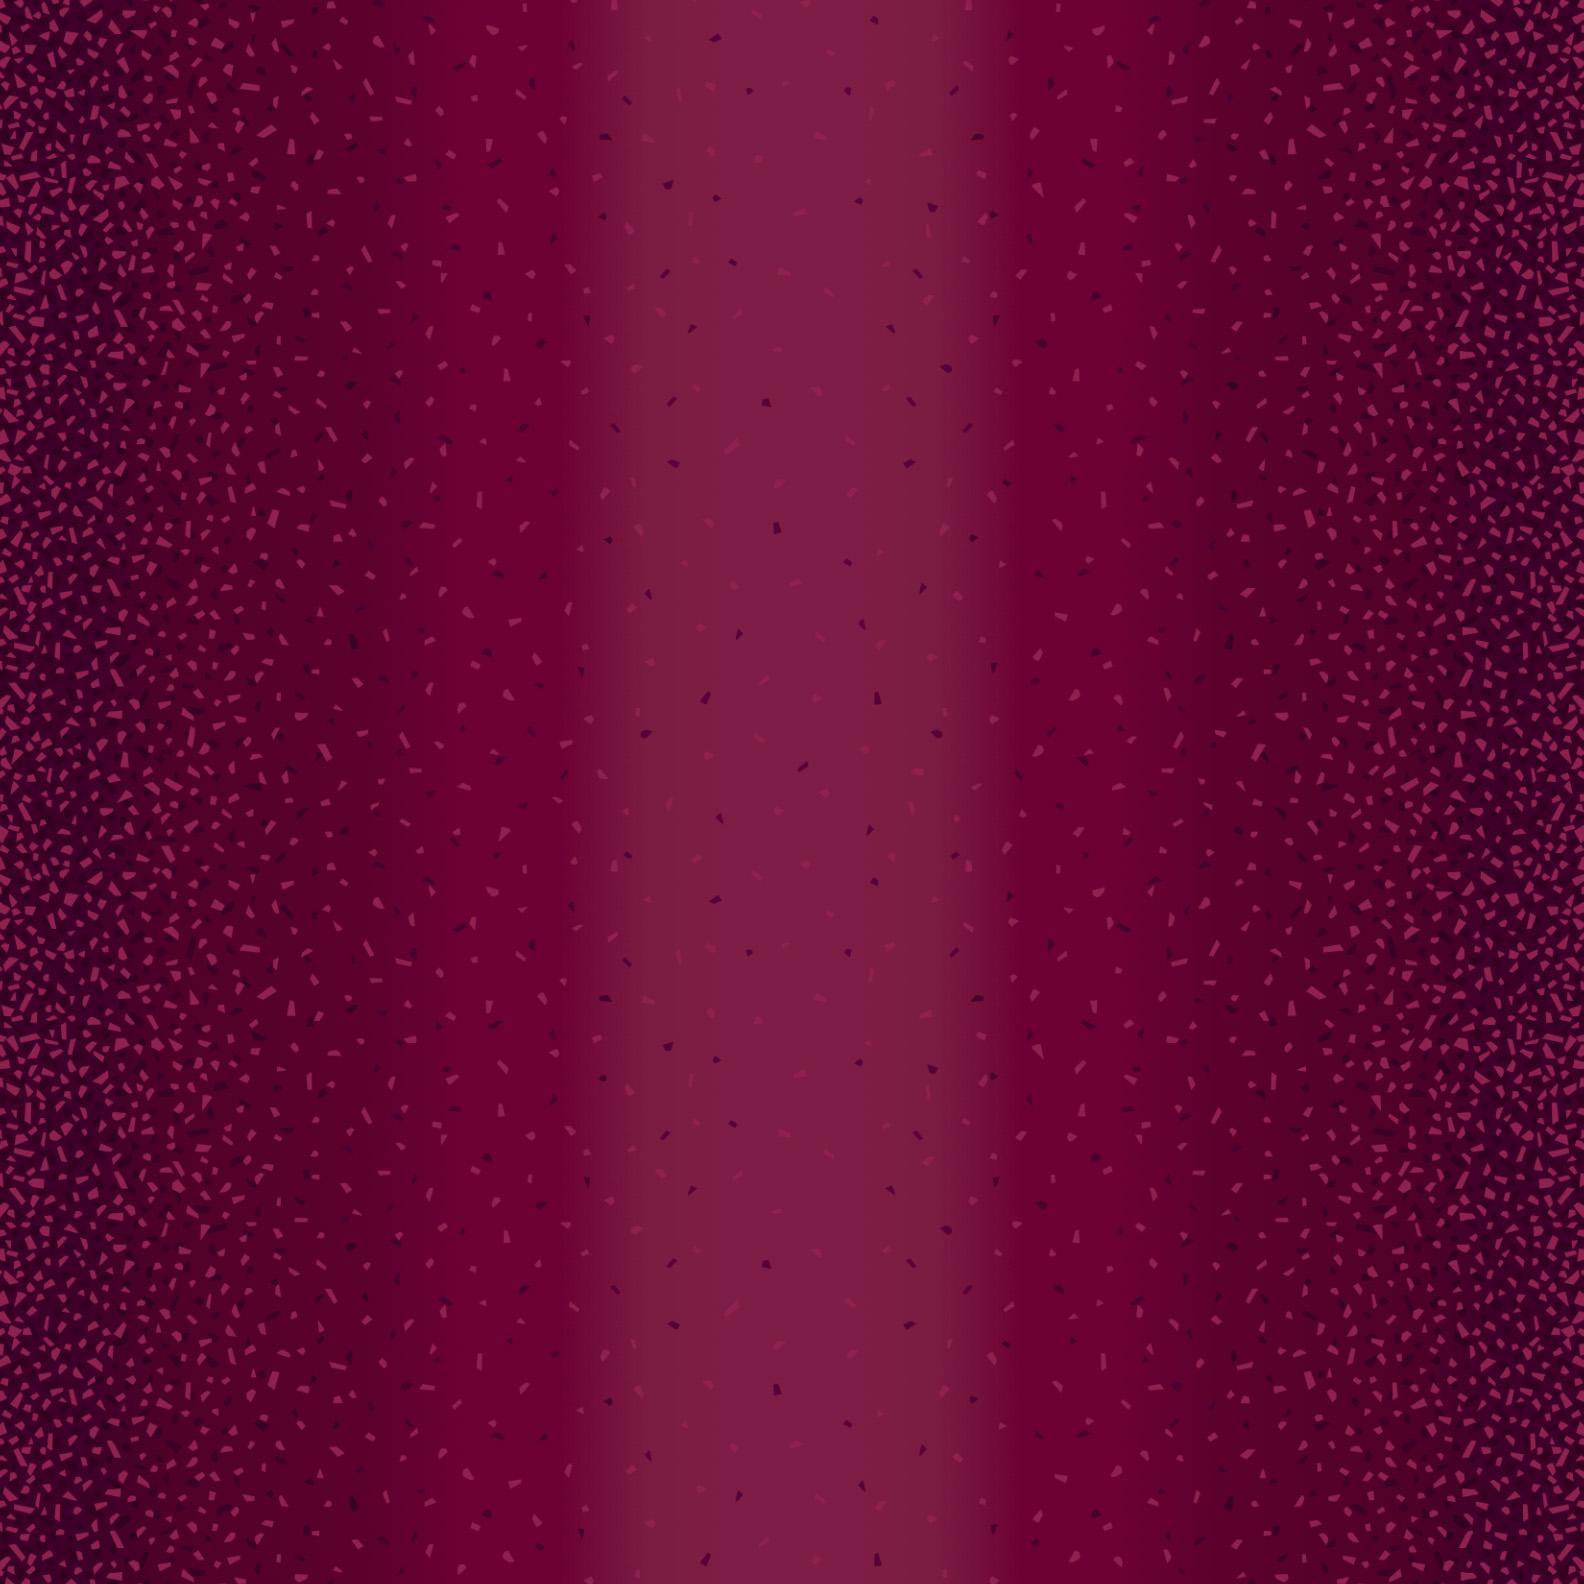 5086-87P Merlot